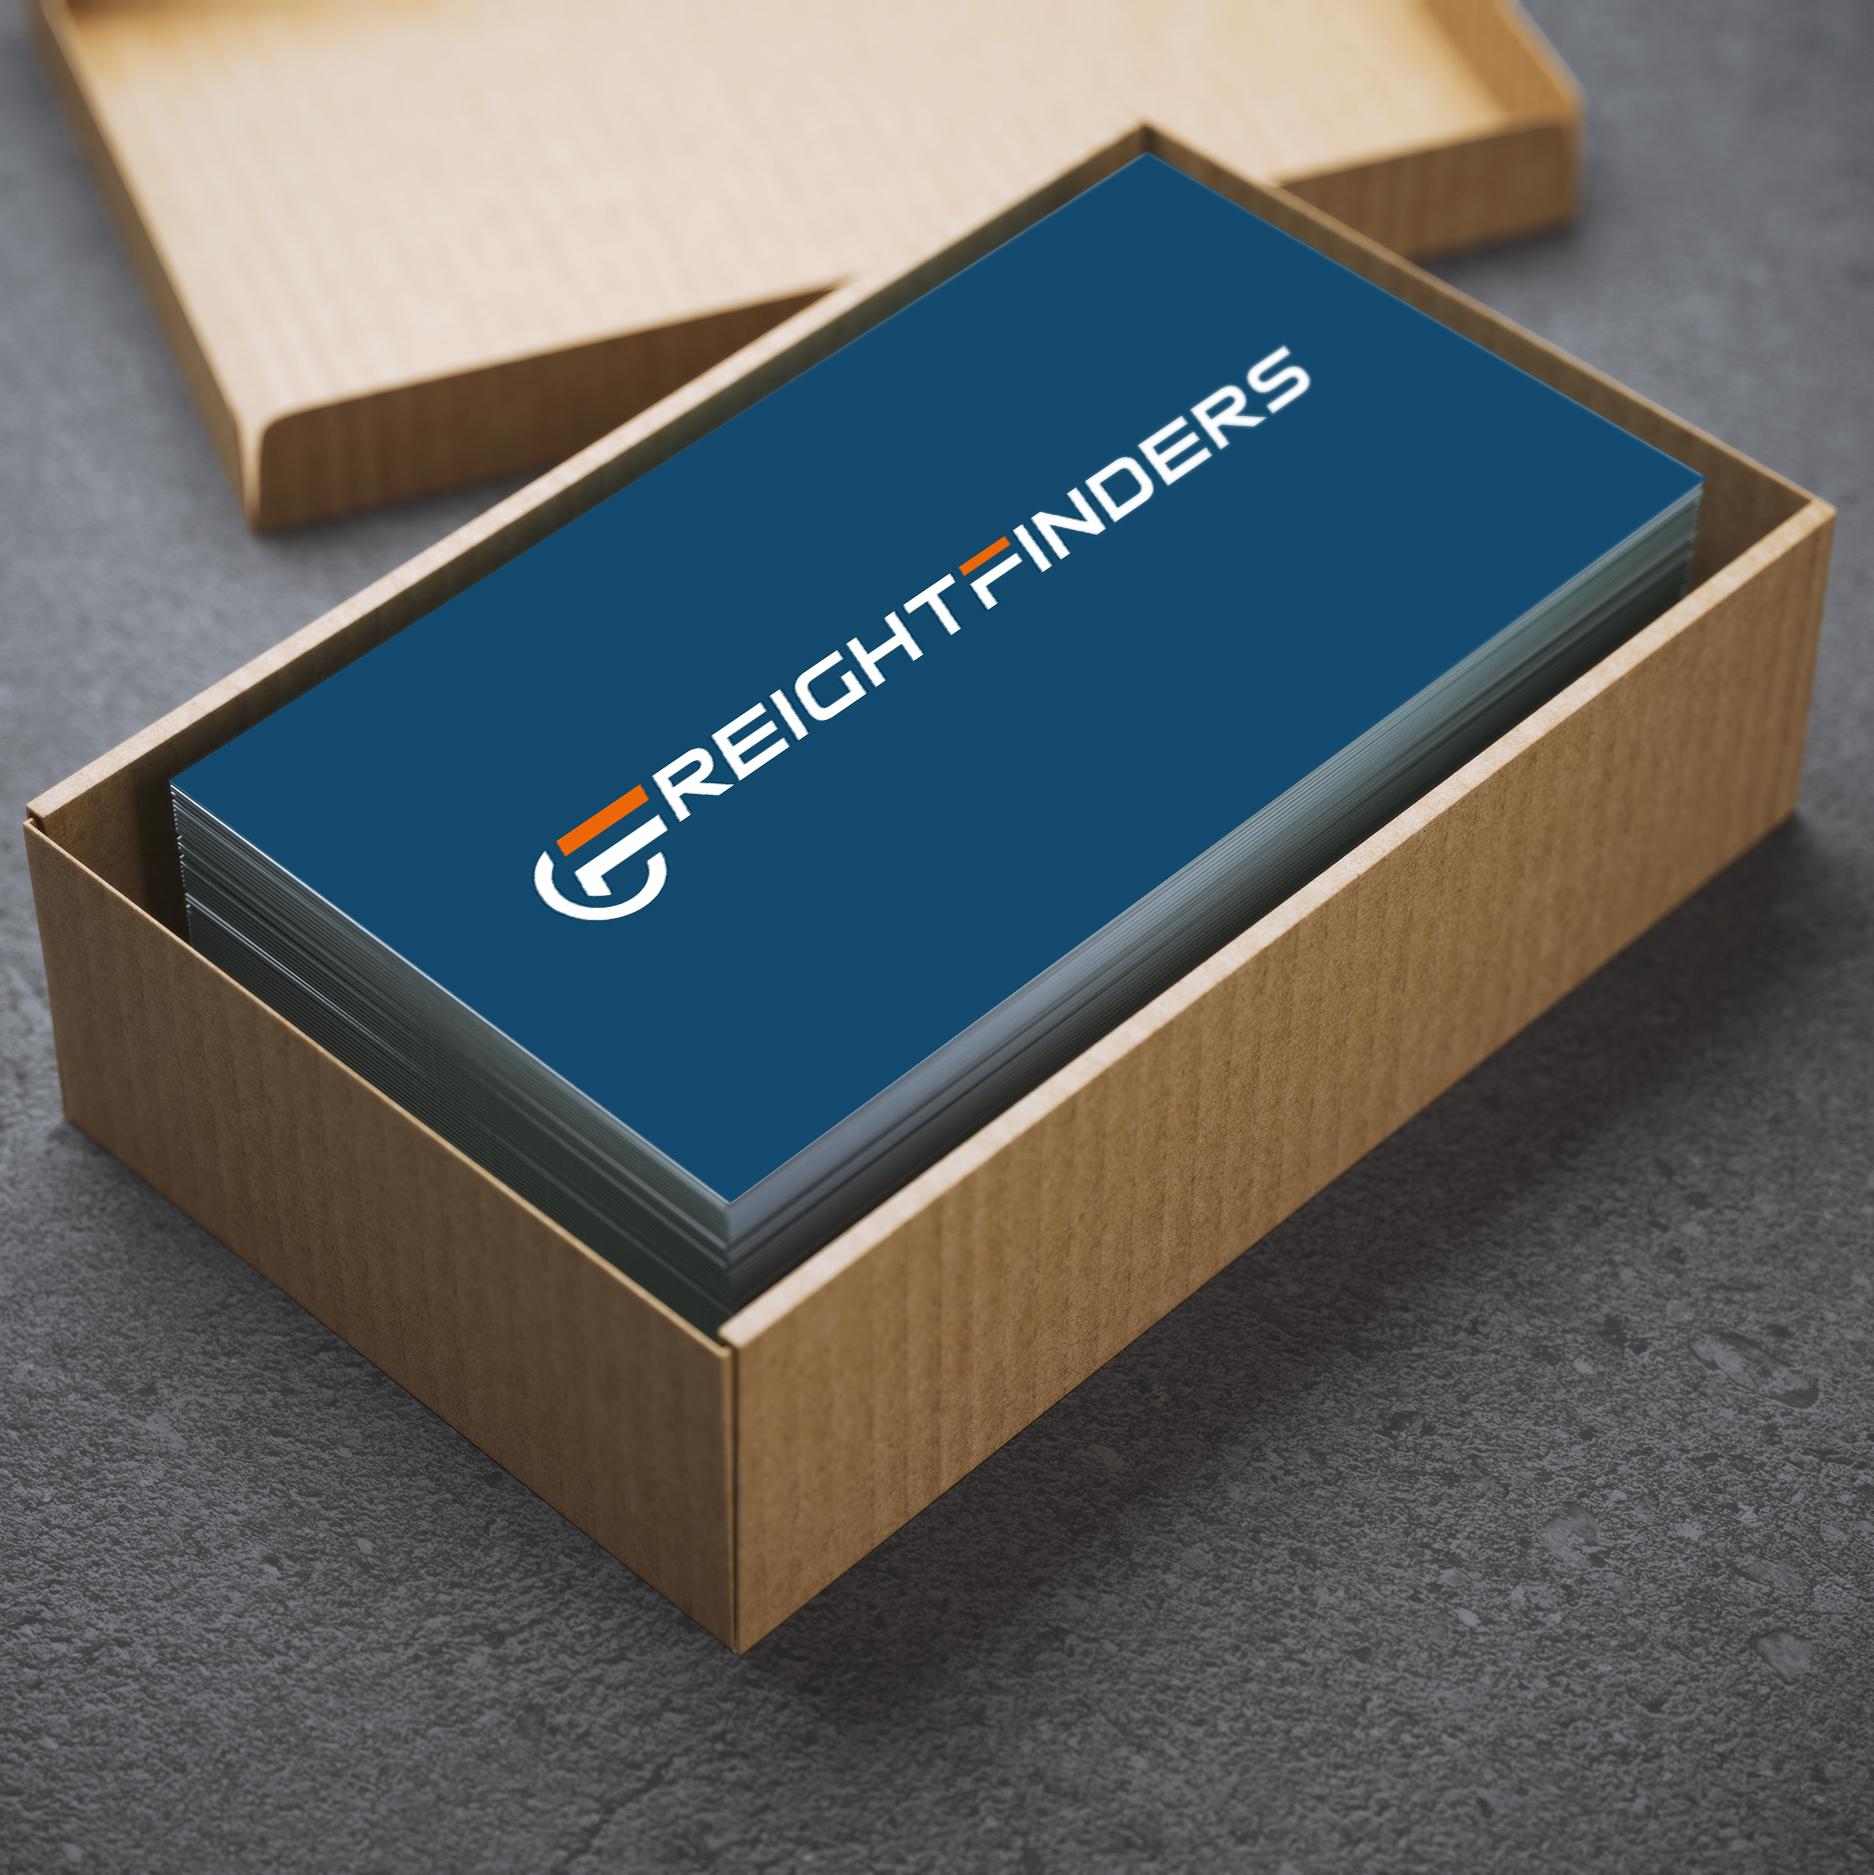 business-card-in-cardboard-box-mockup-free-psd.jpg